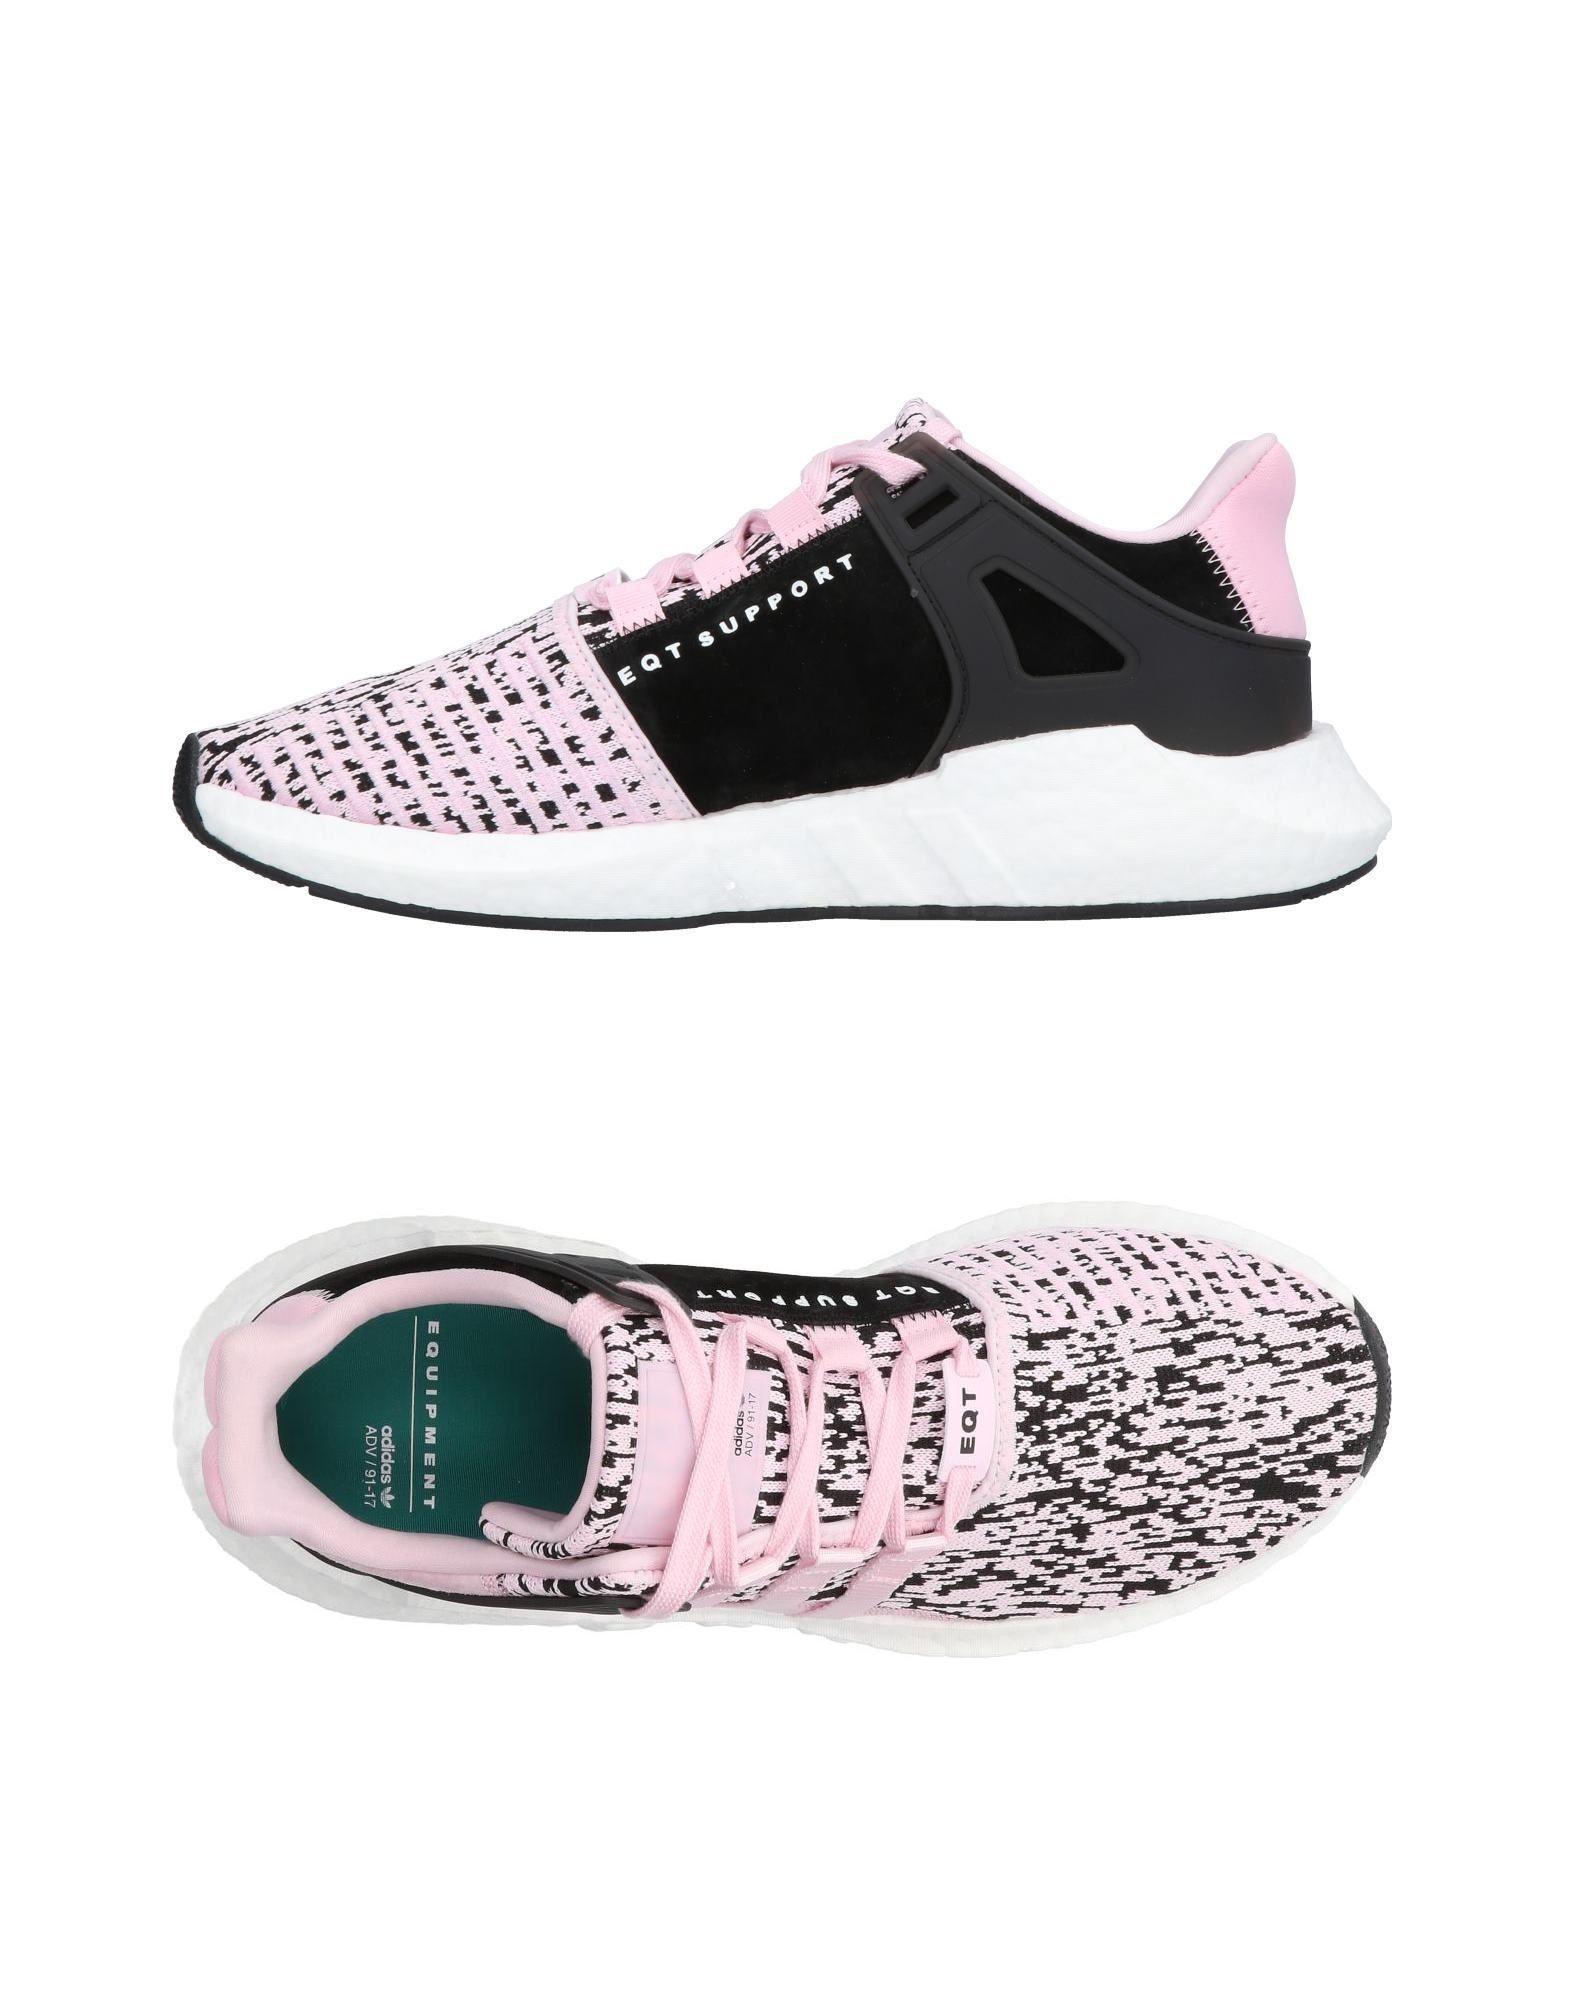 Adidas Originals Sneakers In Pink